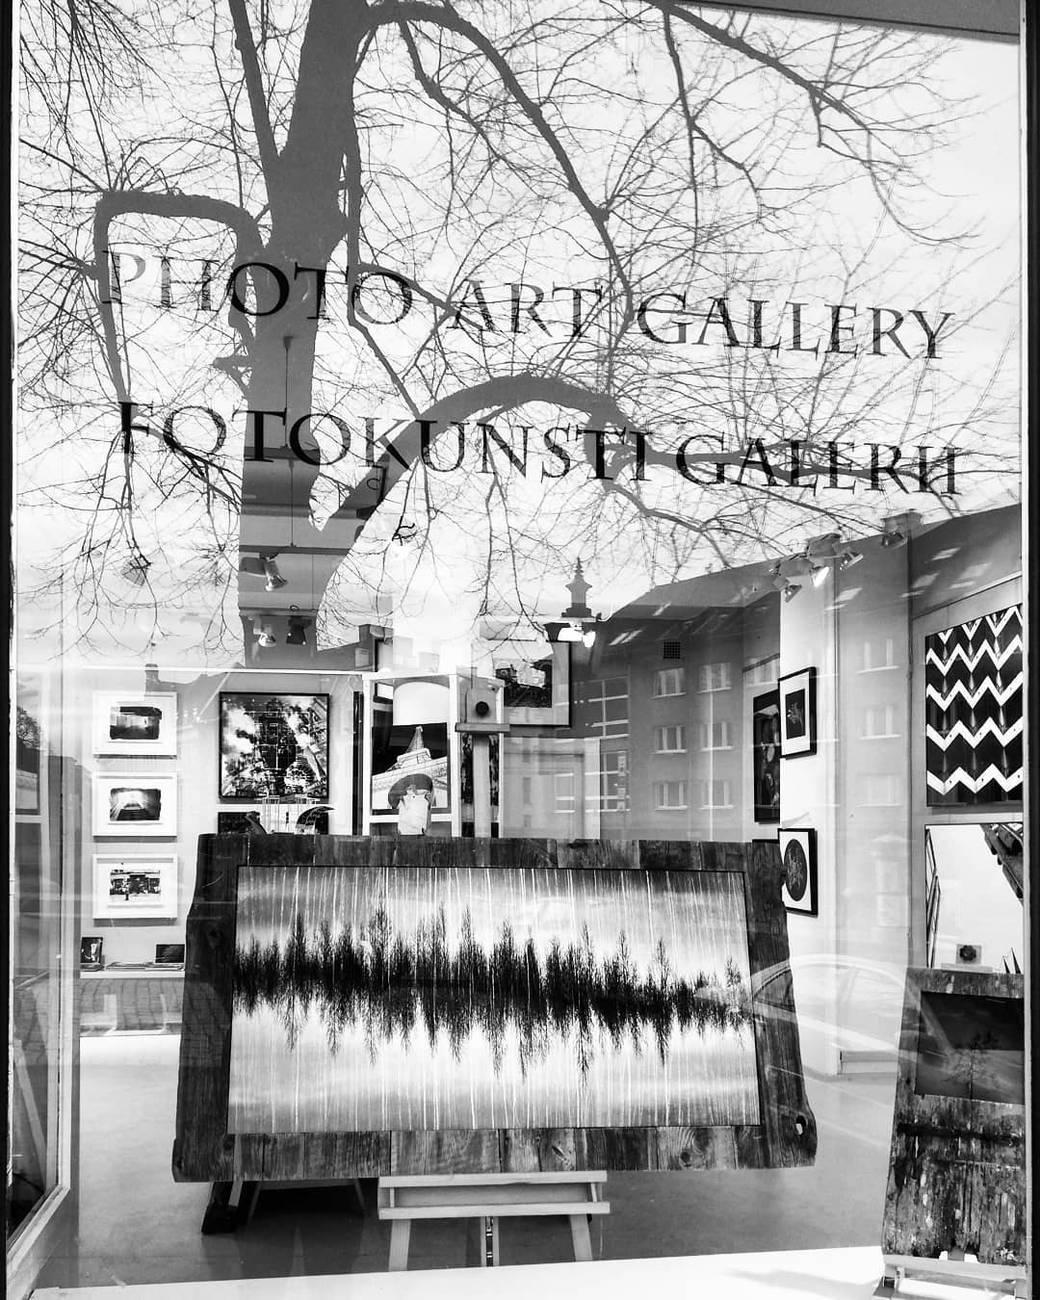 Okapi gallery in Tallinn, Estonia